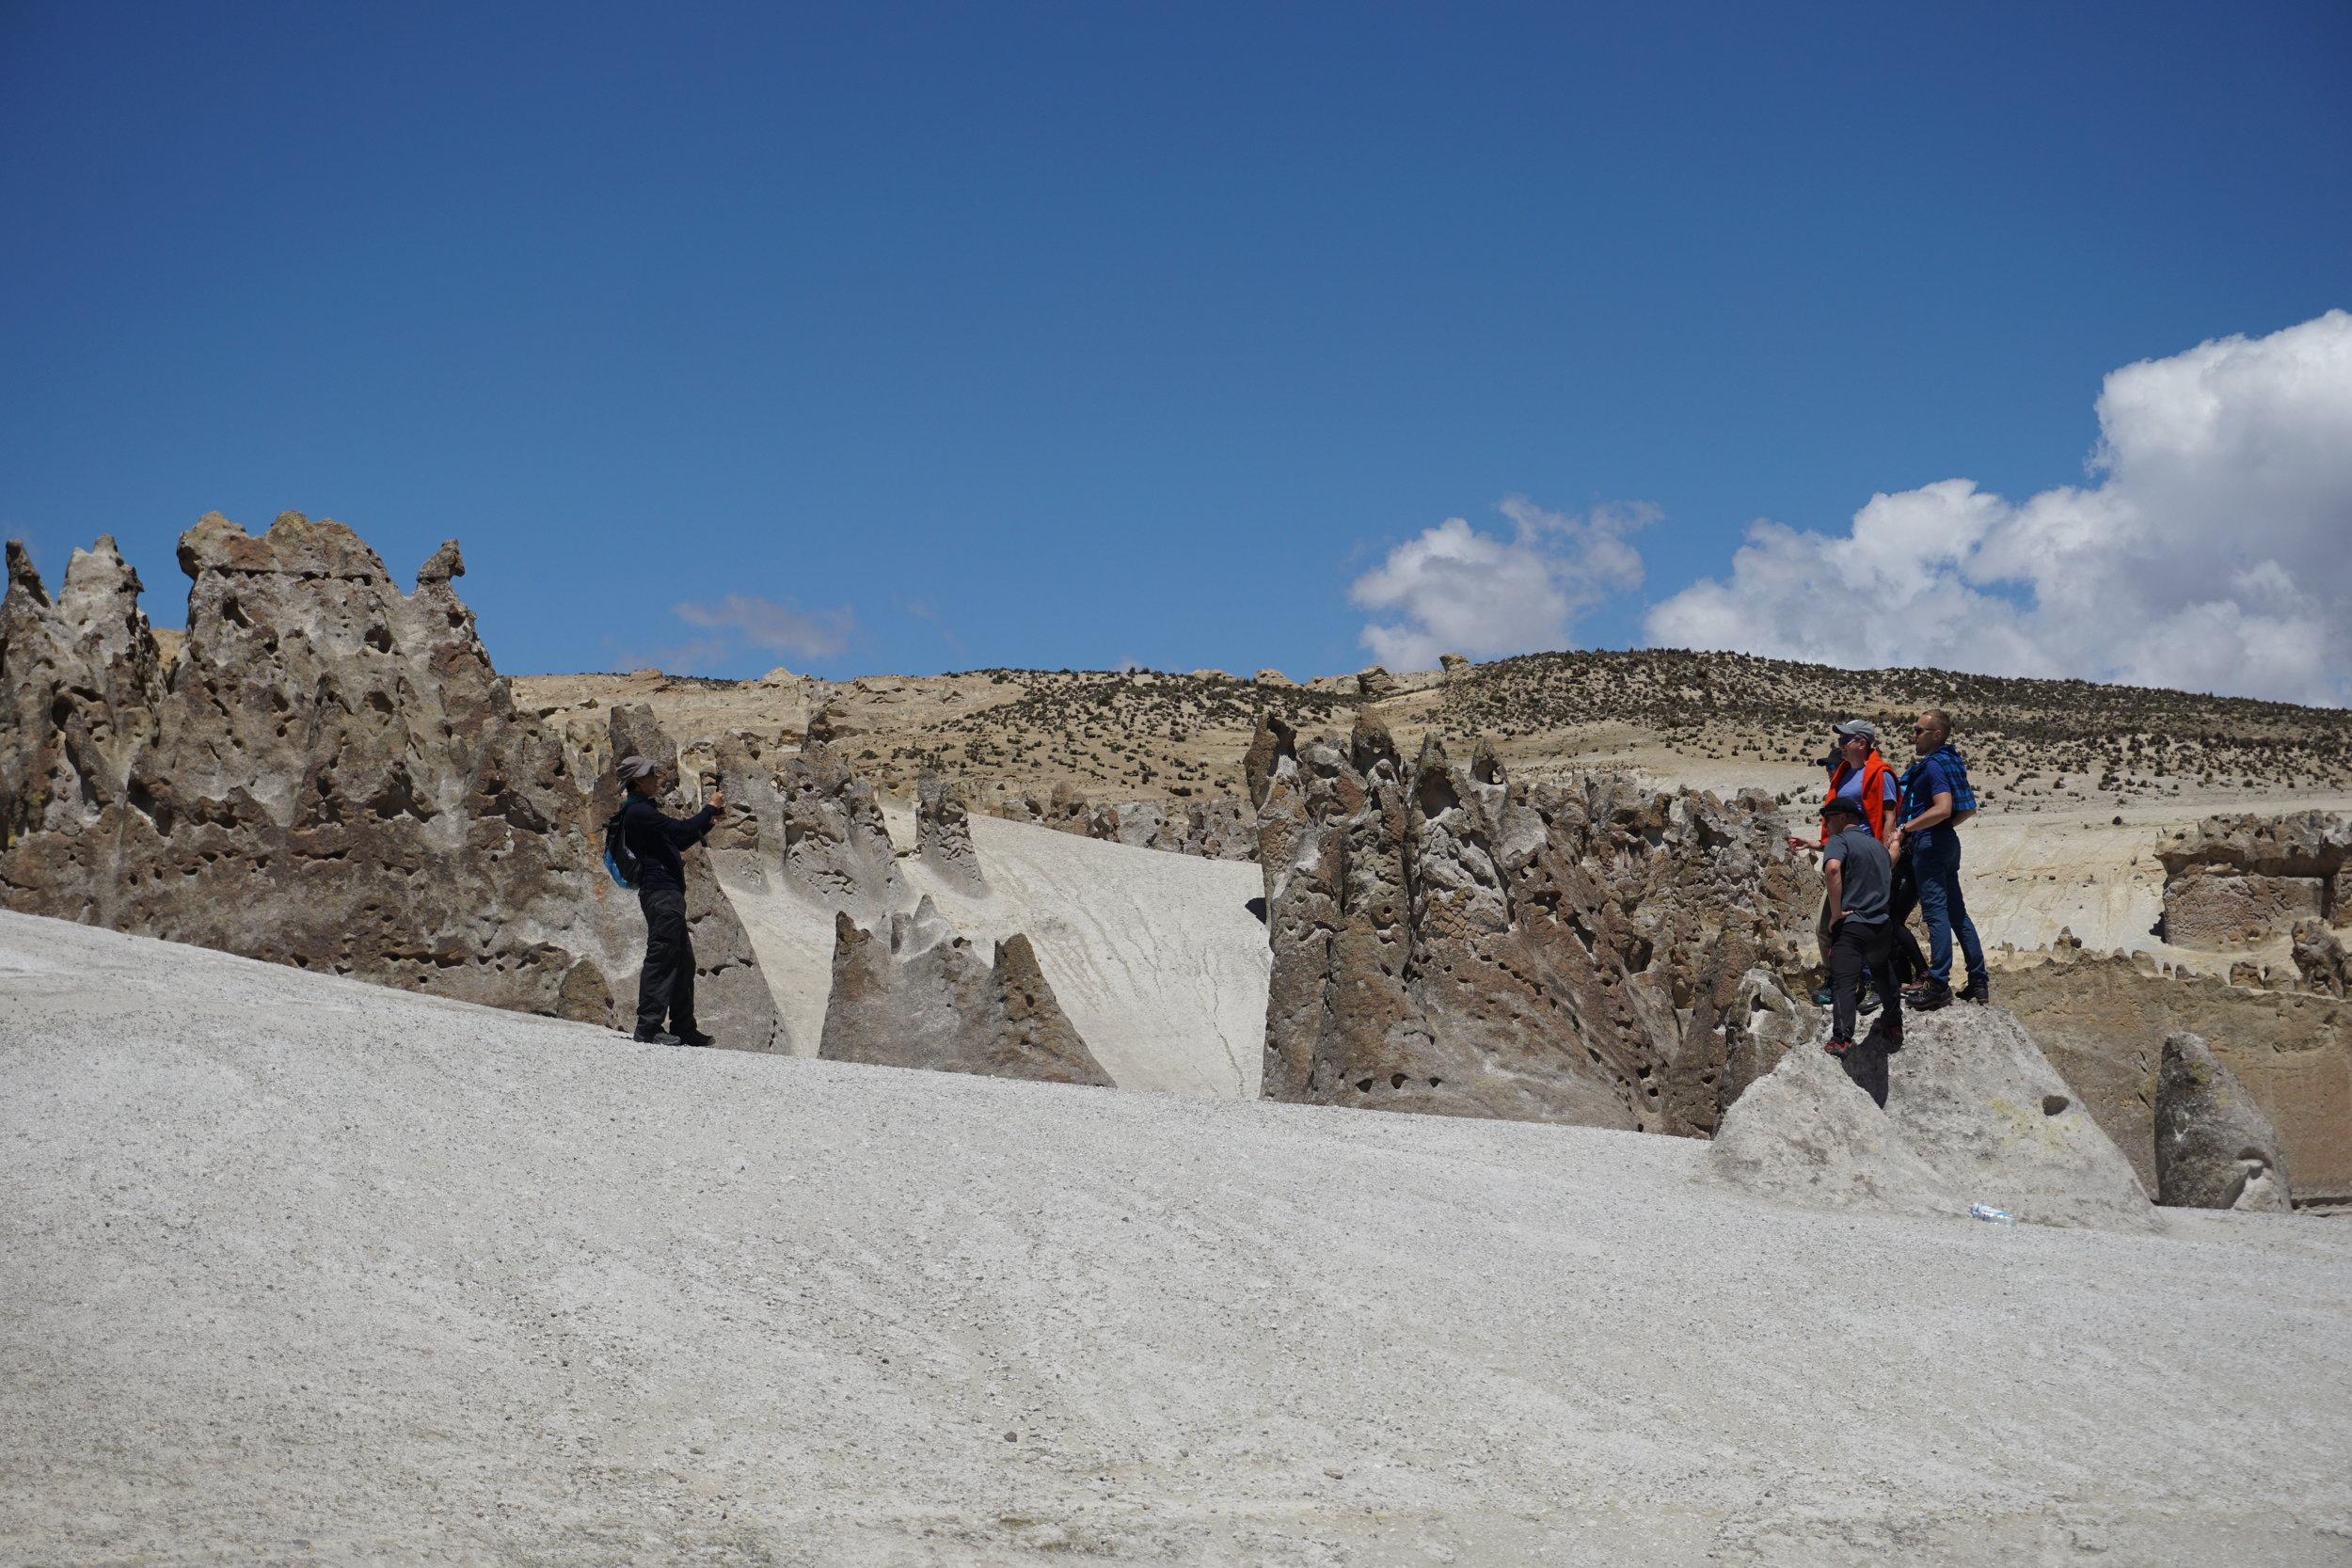 Salidas y Aguada Blanca National Reserve